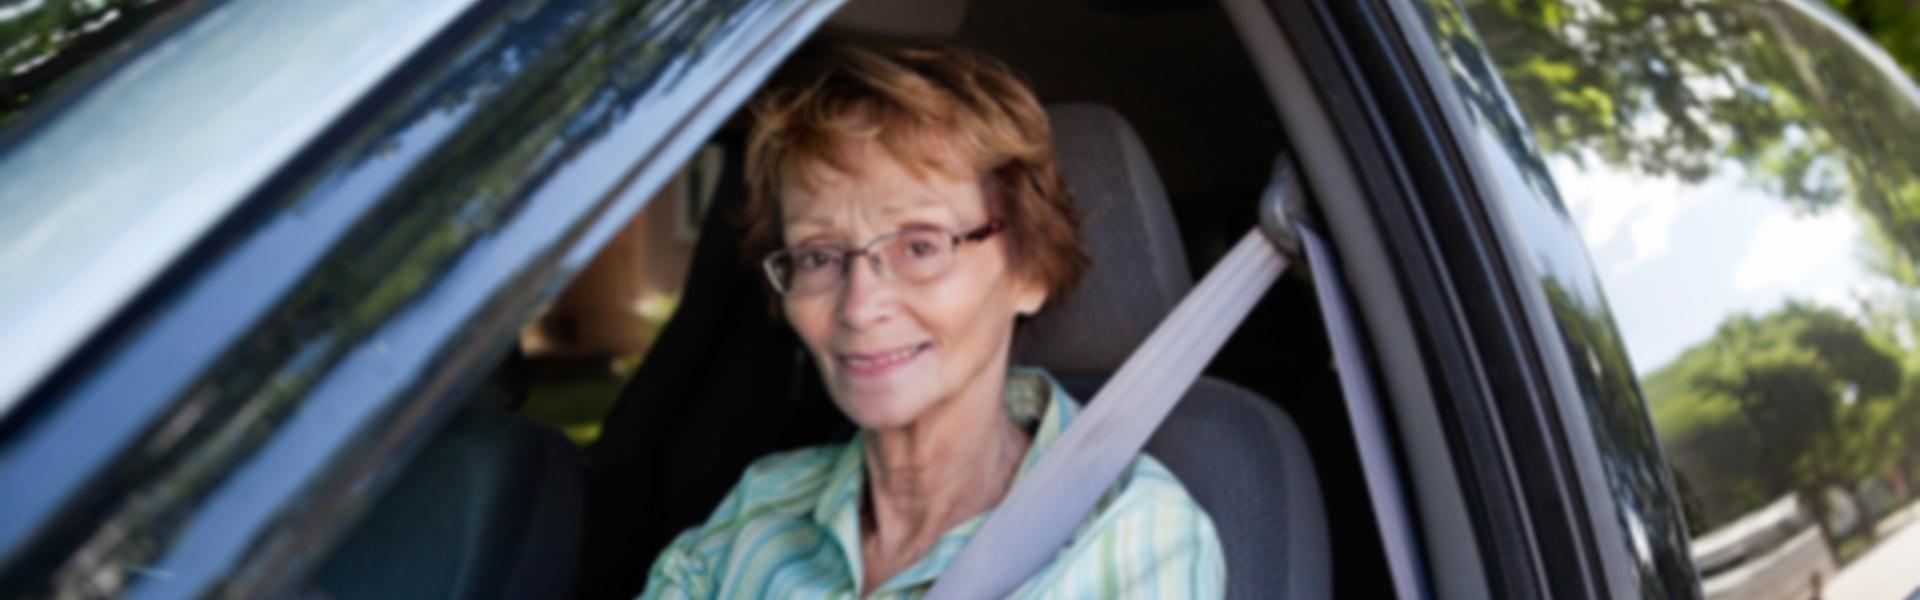 Woman driving in car.jpg